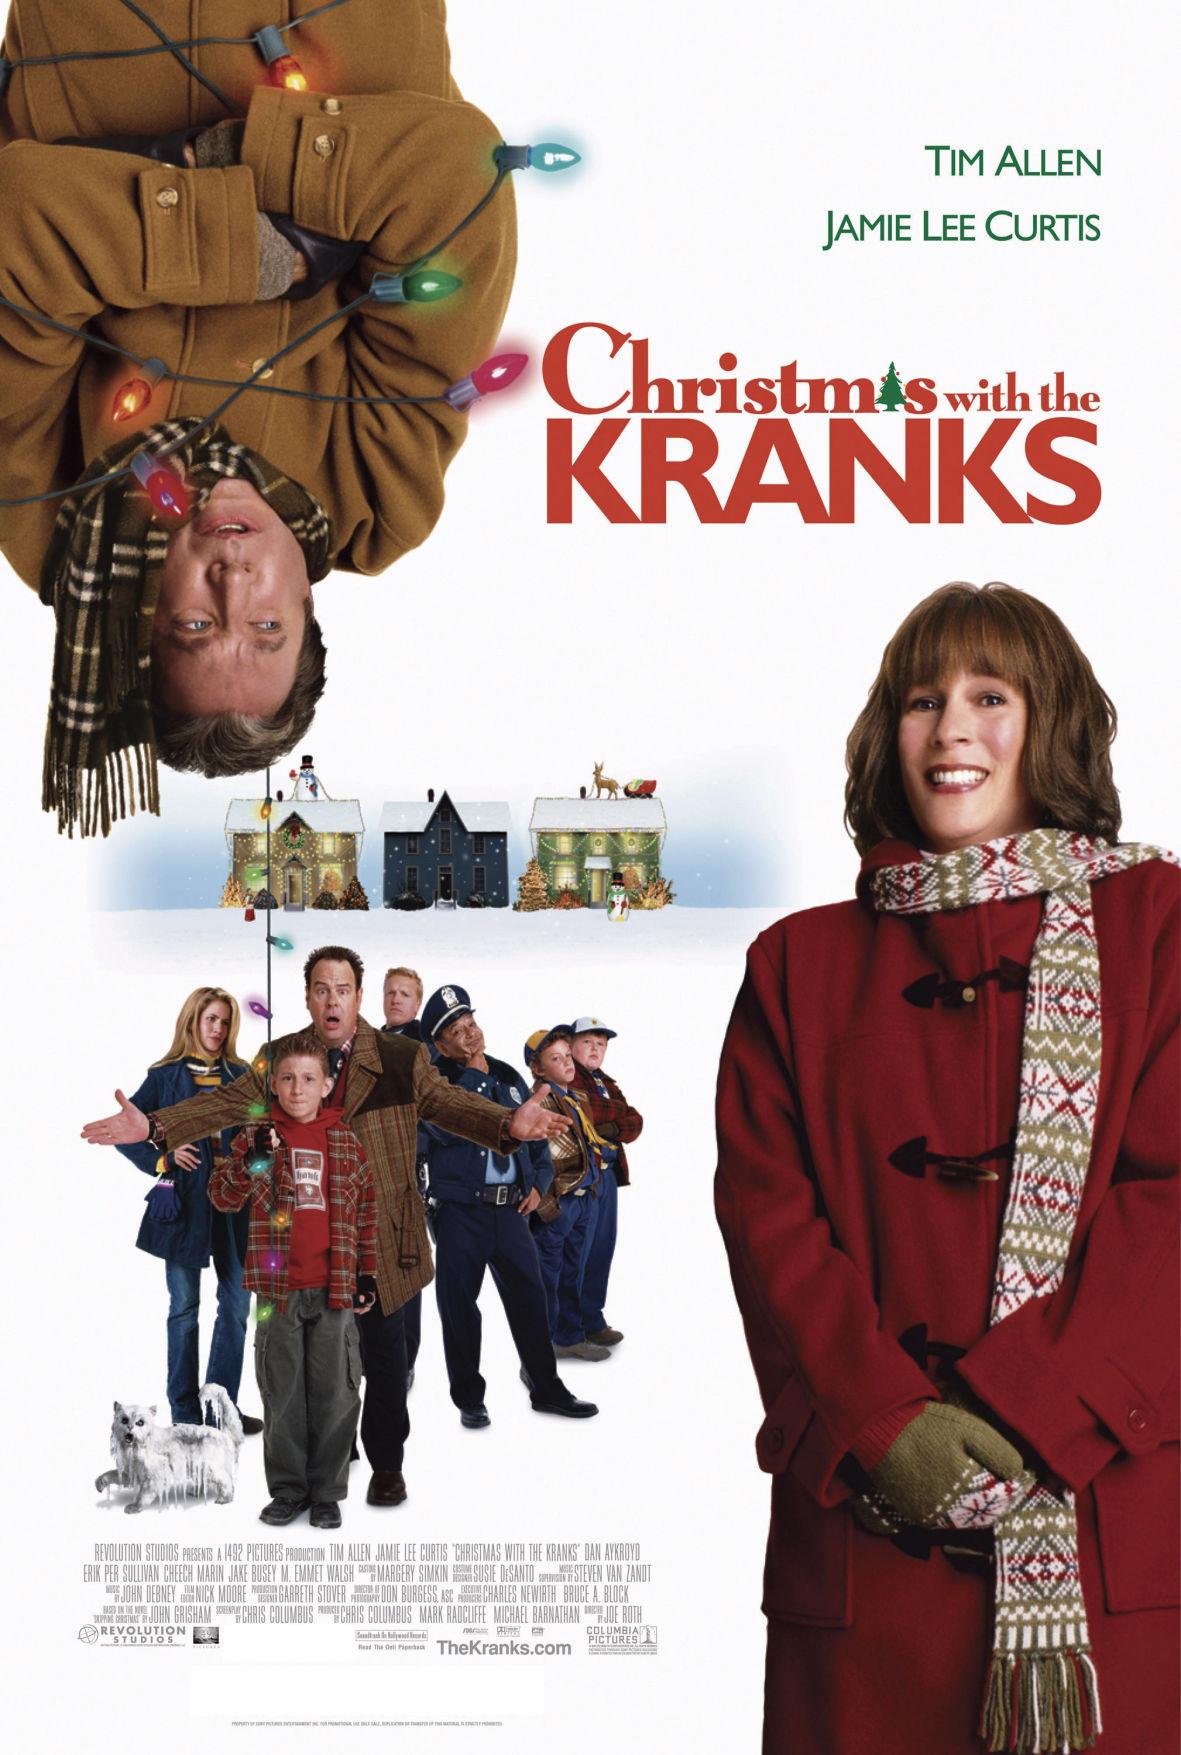 Top 10 Christmas Movies | Local | helenair.com